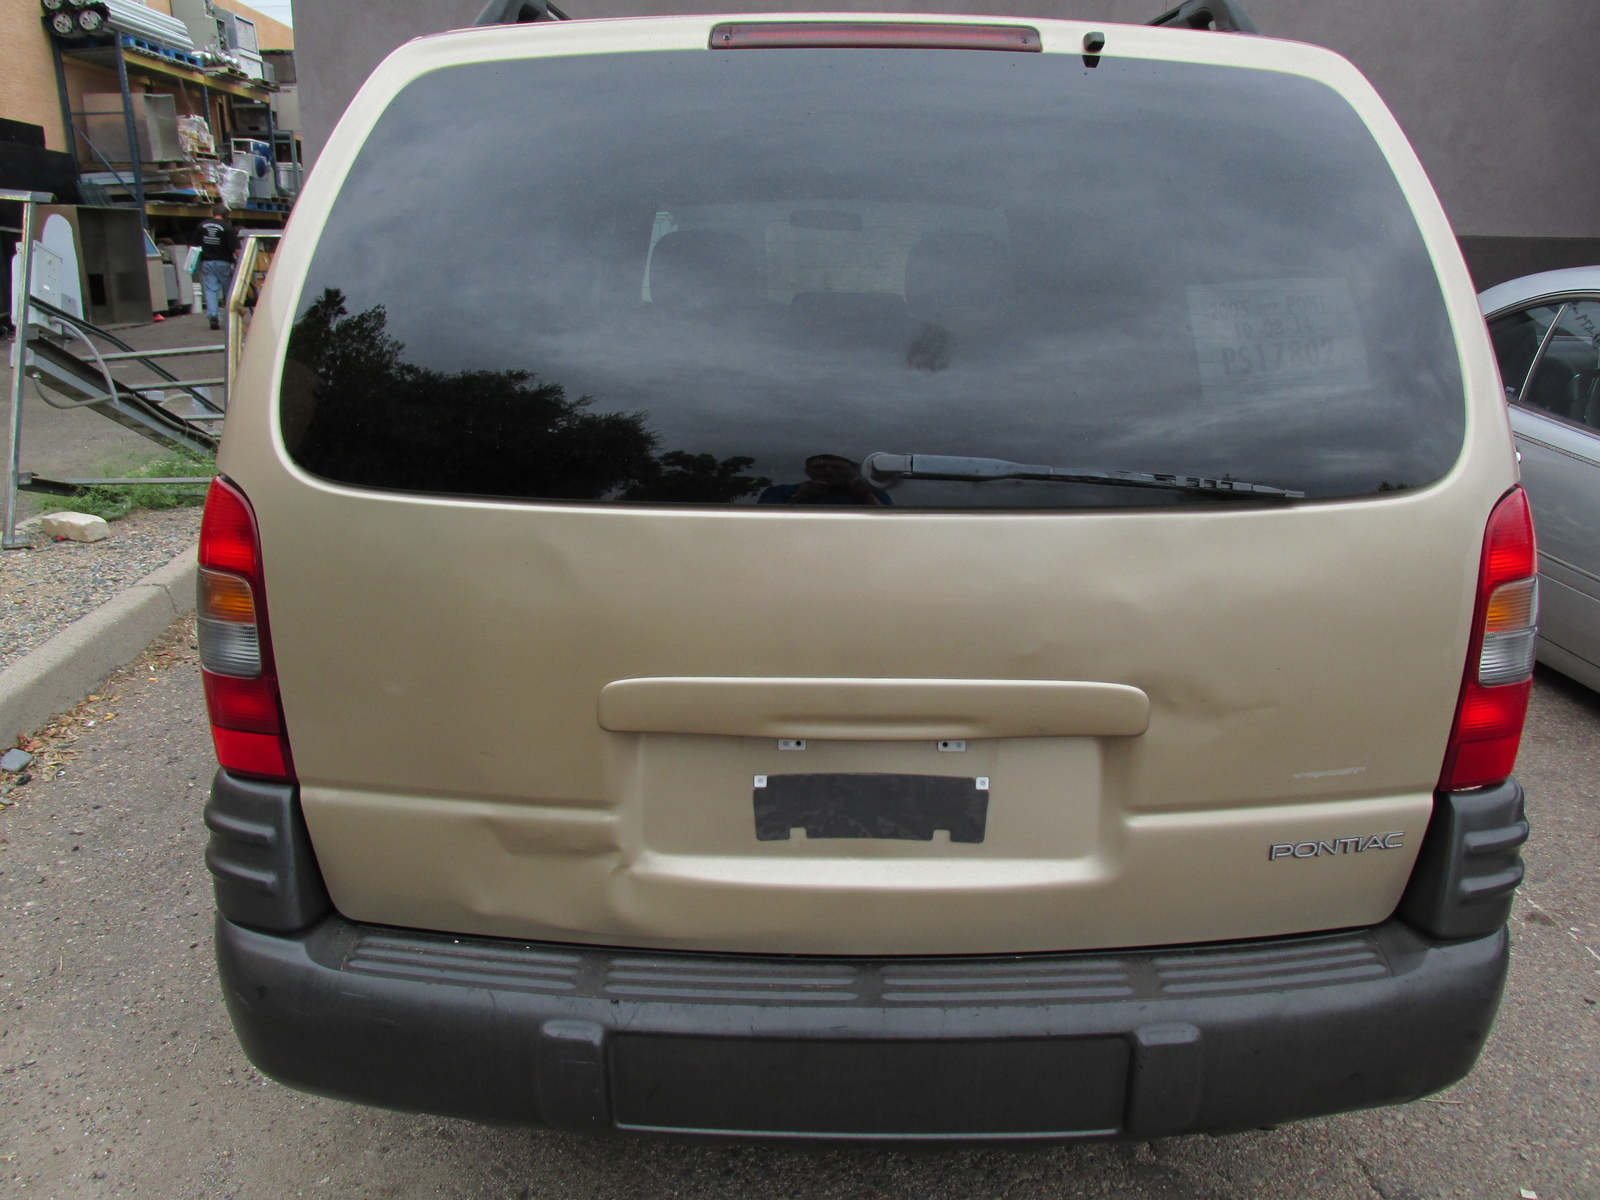 Picture of 2005 Pontiac Montana 1SE